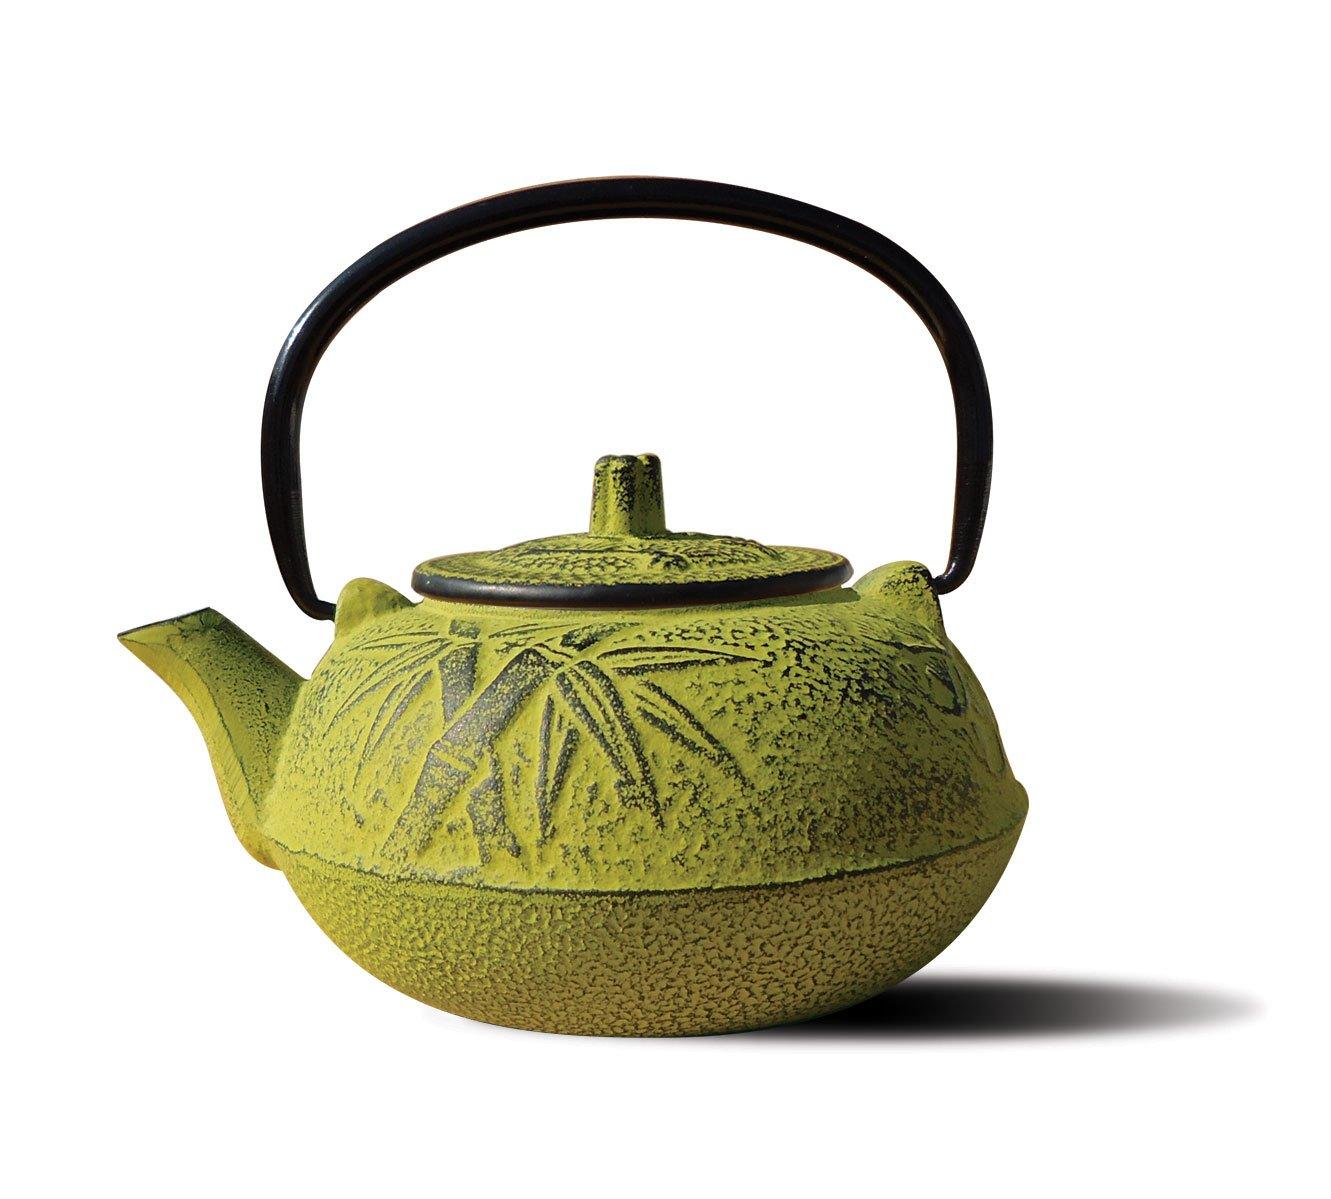 Amazon.com: Old Dutch Cast Iron Osaka Teapot, 20-Ounce, Moss Green ...